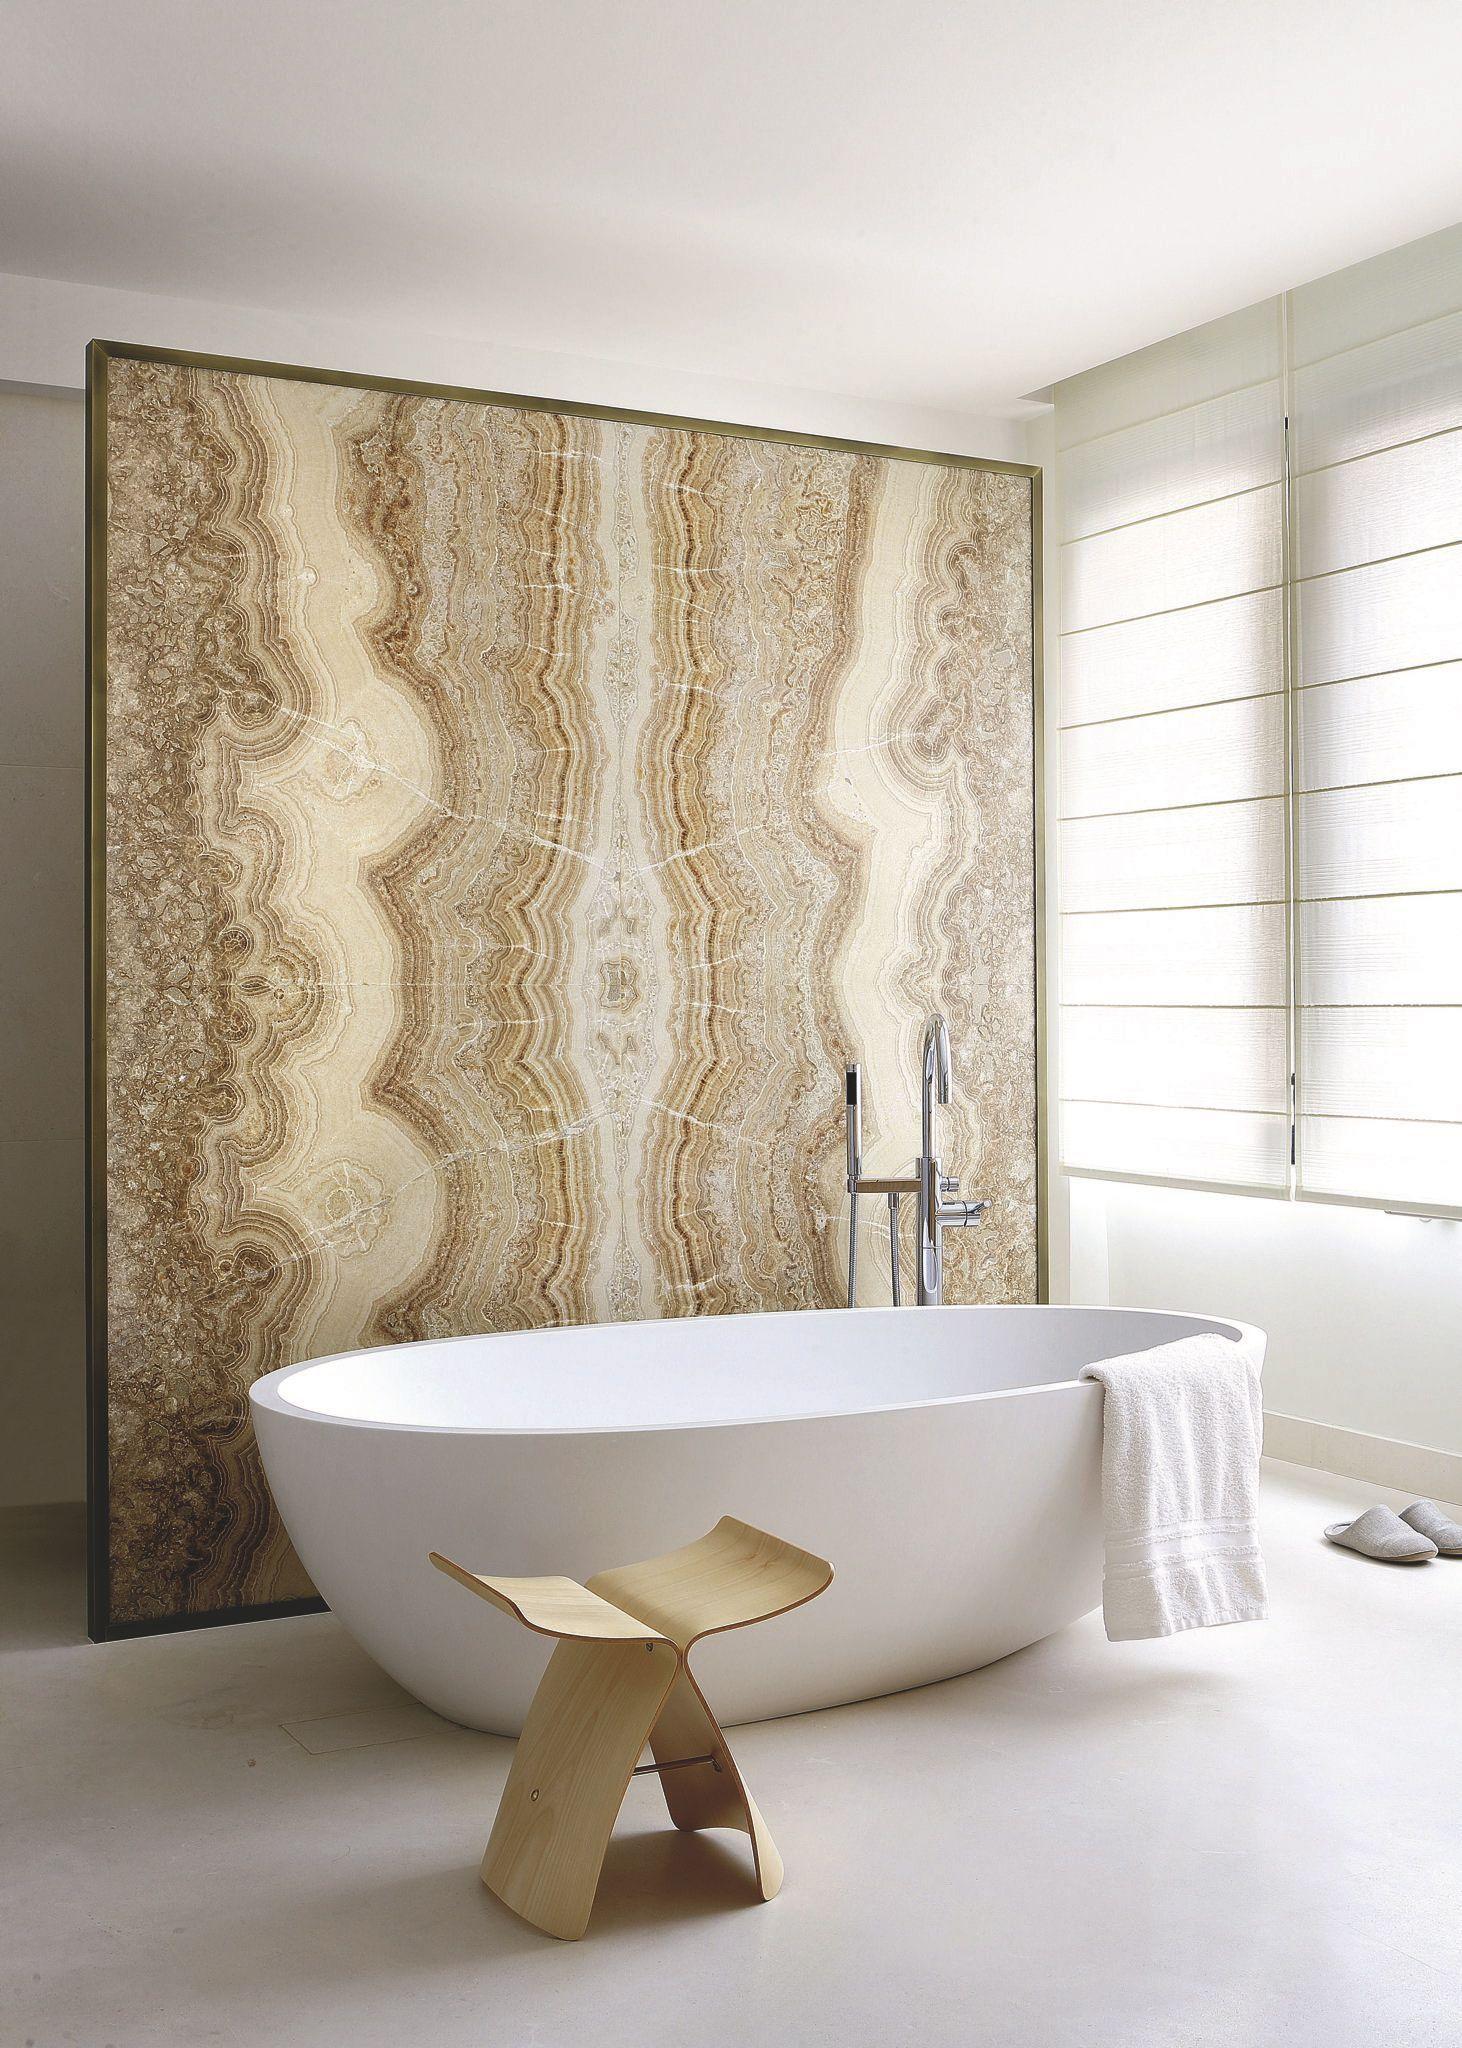 Bathroom in Paris by Fabrice Ausset - Wall in Onyx and bath tub ...